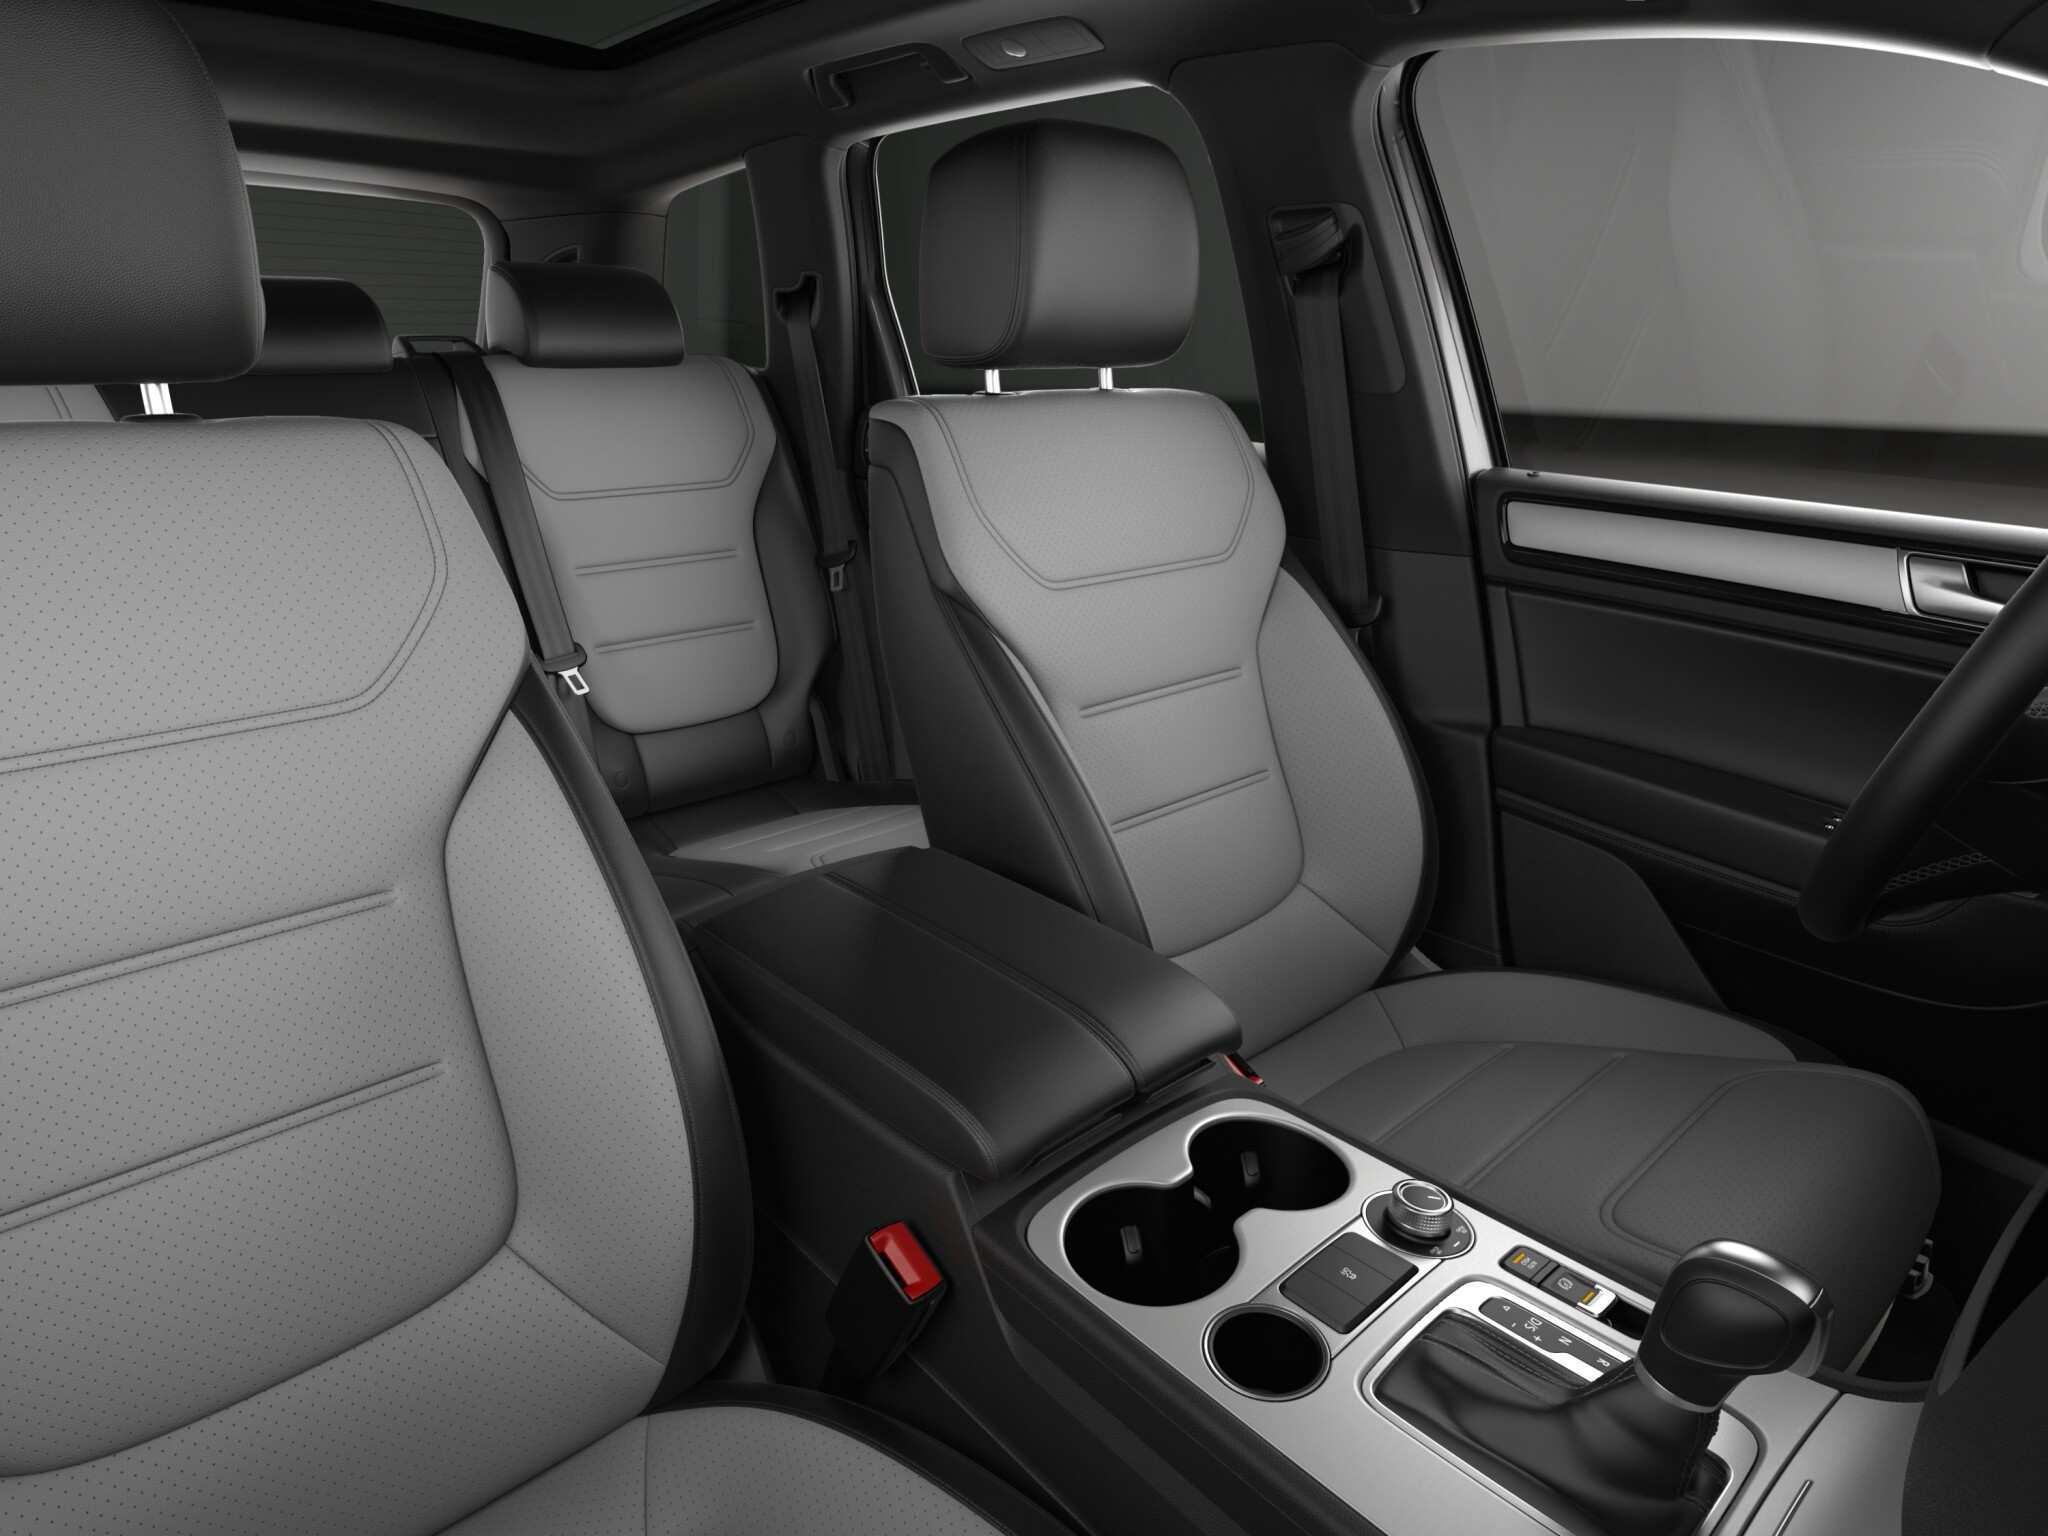 84 New 2019 Volkswagen Touareg Interior New Concept with 2019 Volkswagen Touareg Interior